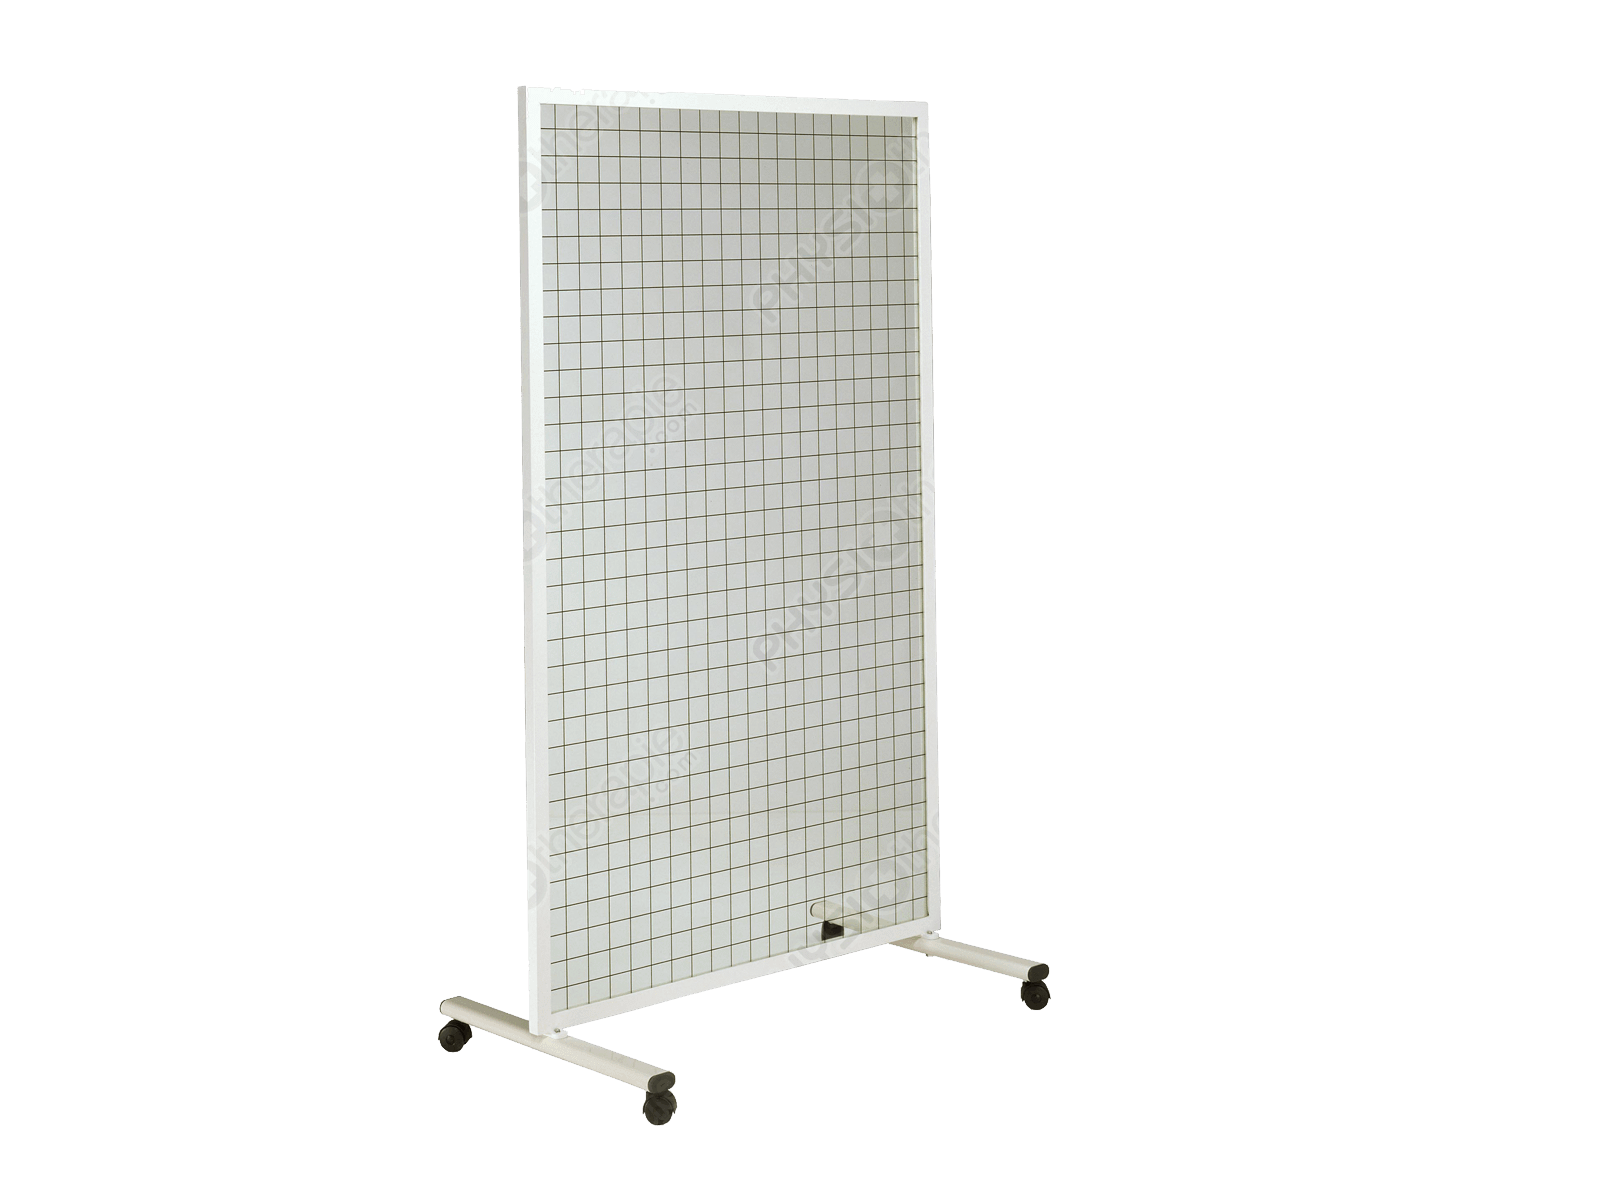 Ferrox miroir quadrill for Miroir quadrille kine